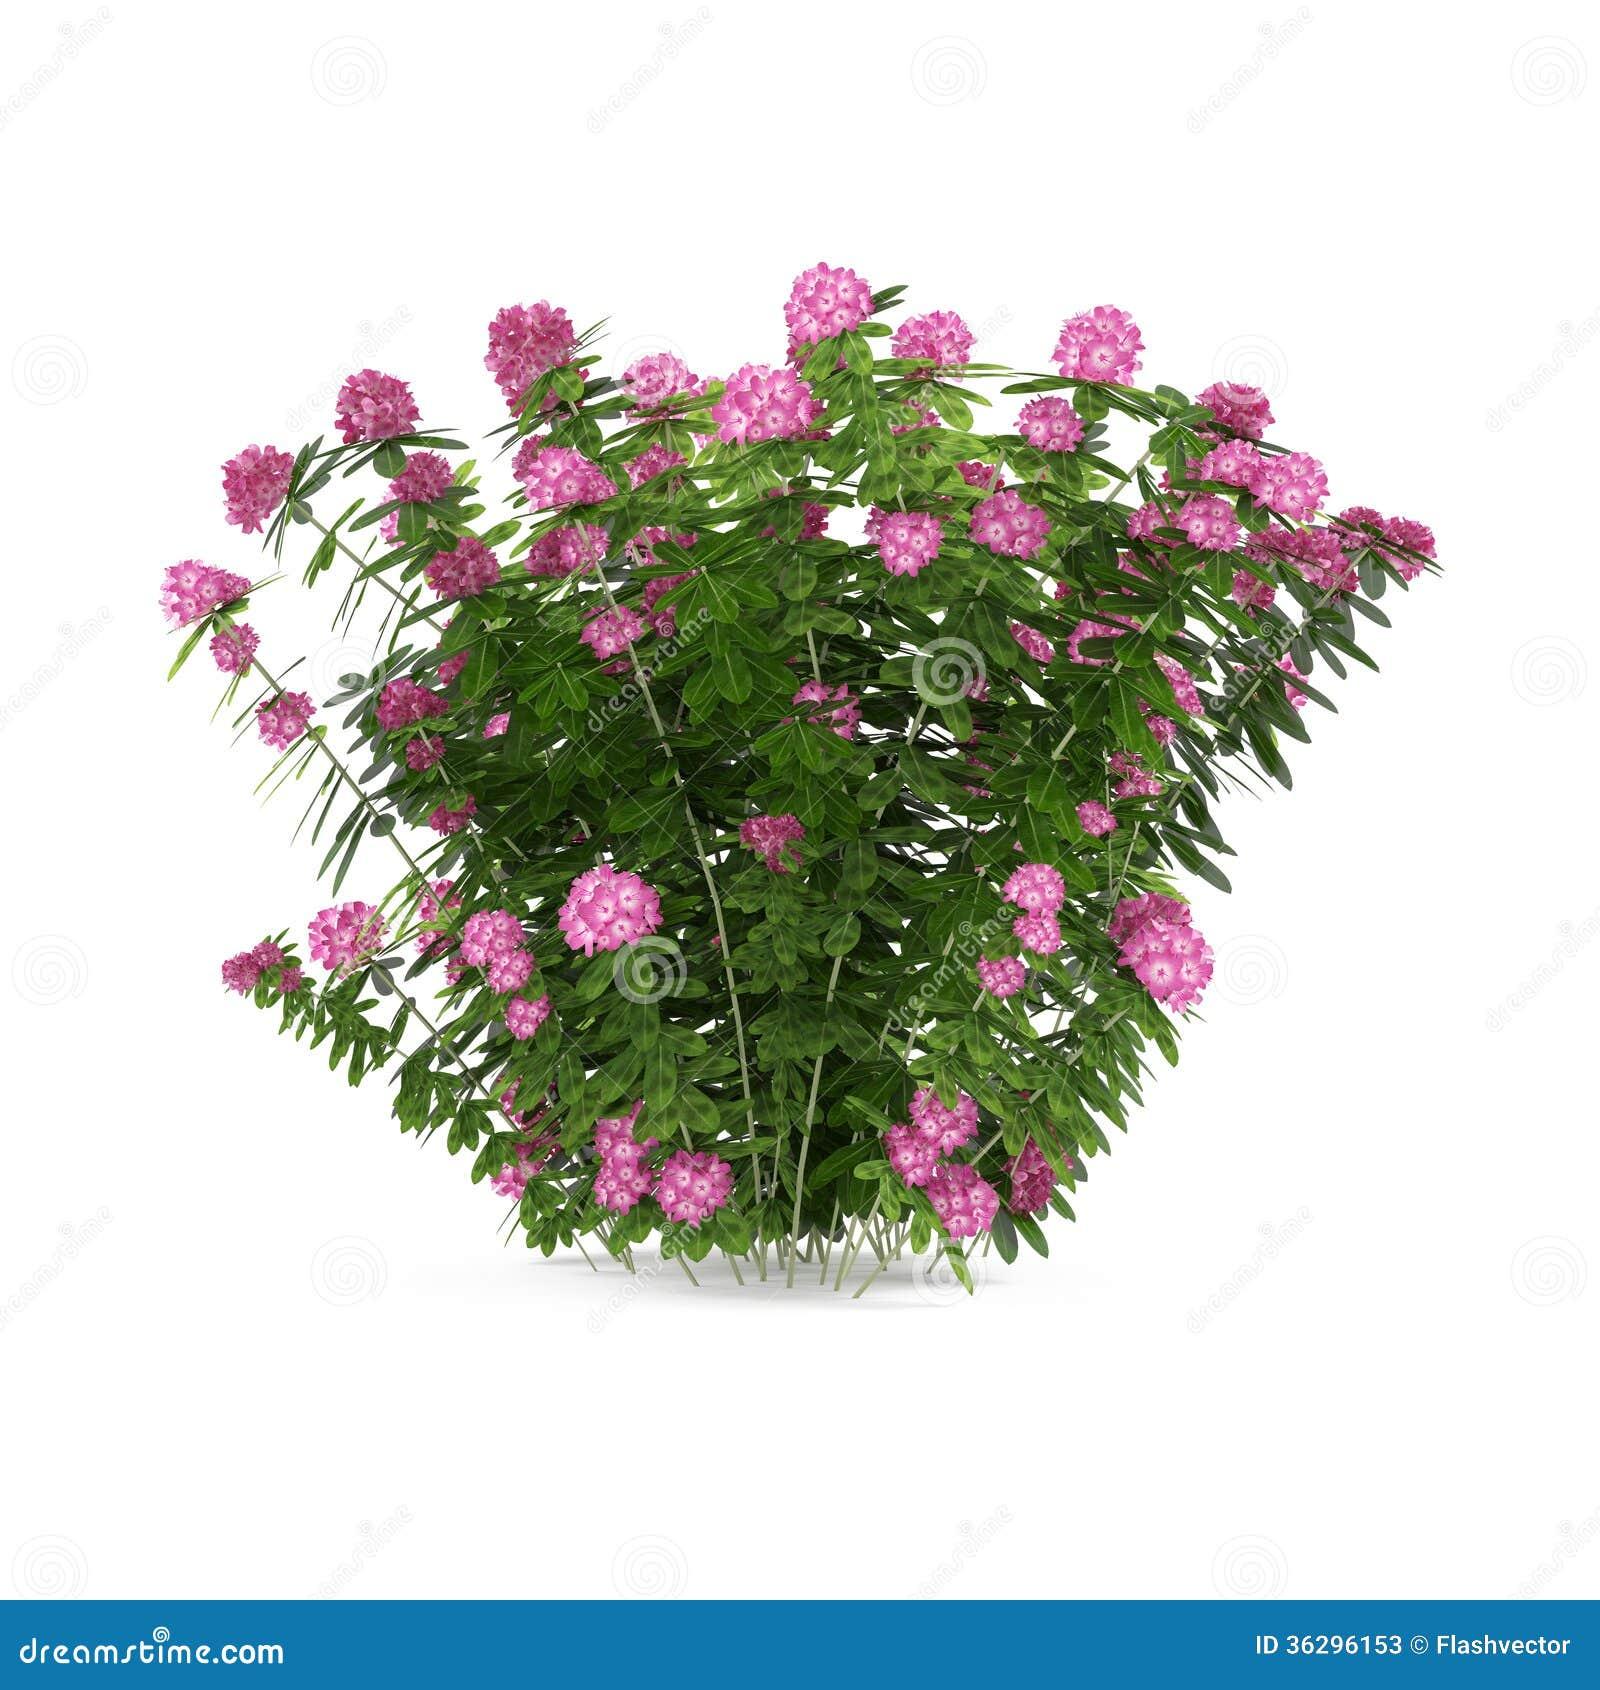 Arbusto da planta com flores cor de rosa fotos de stock for Arbustos para jardin con flores